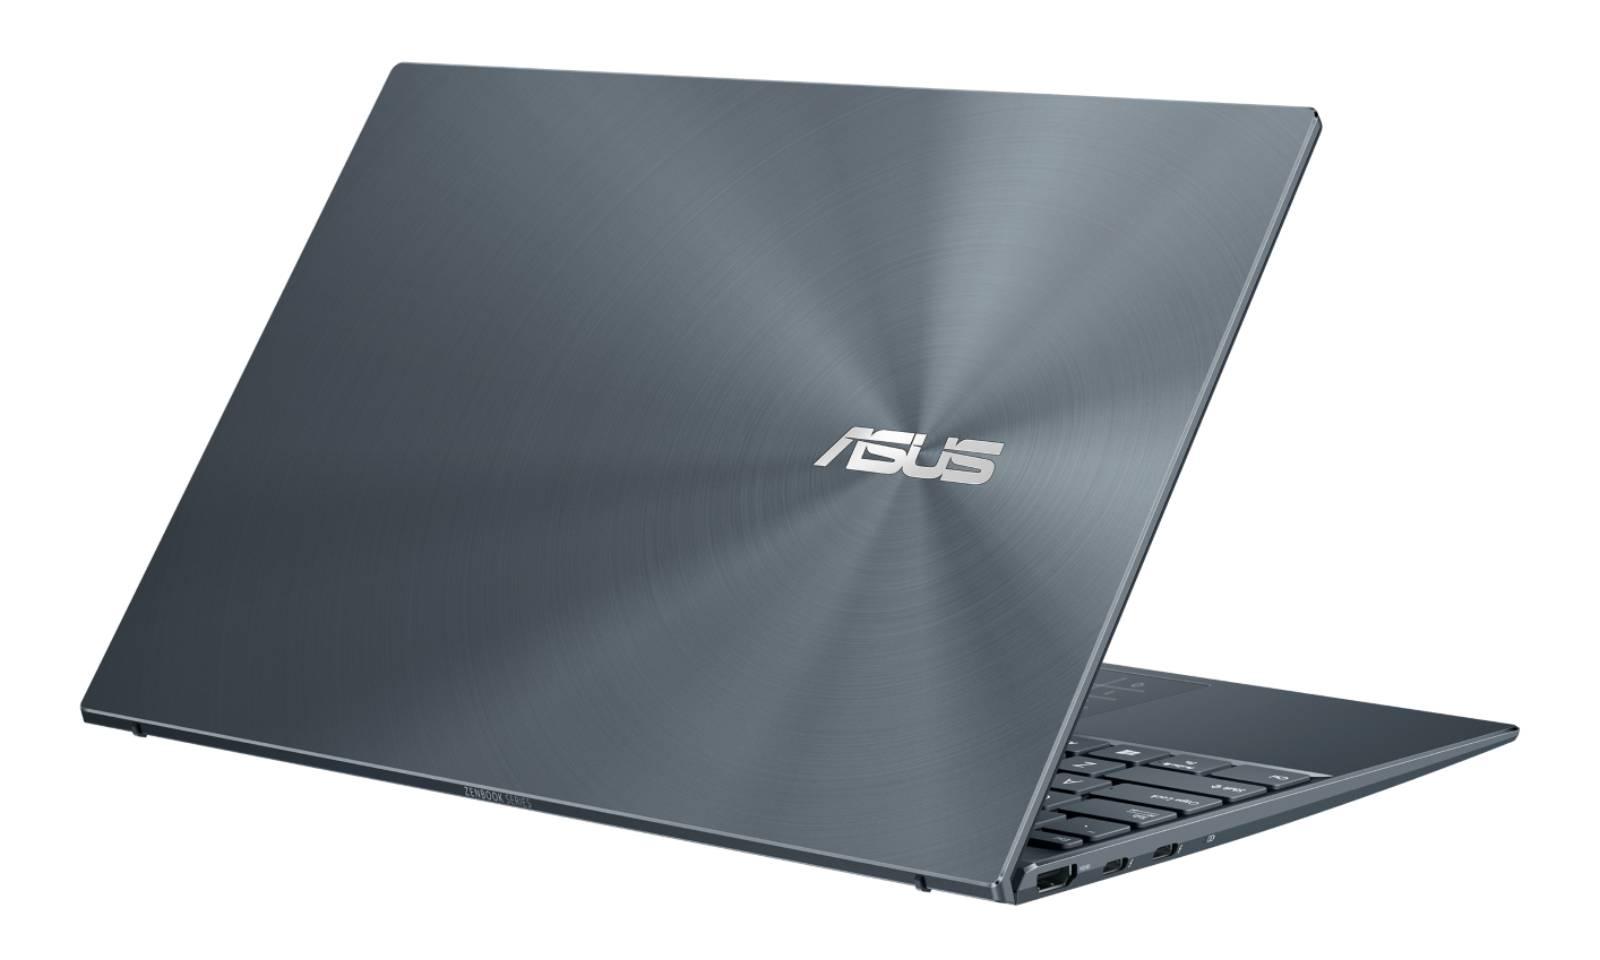 ASUS ZenBook 13/14 (UX325/UX425)